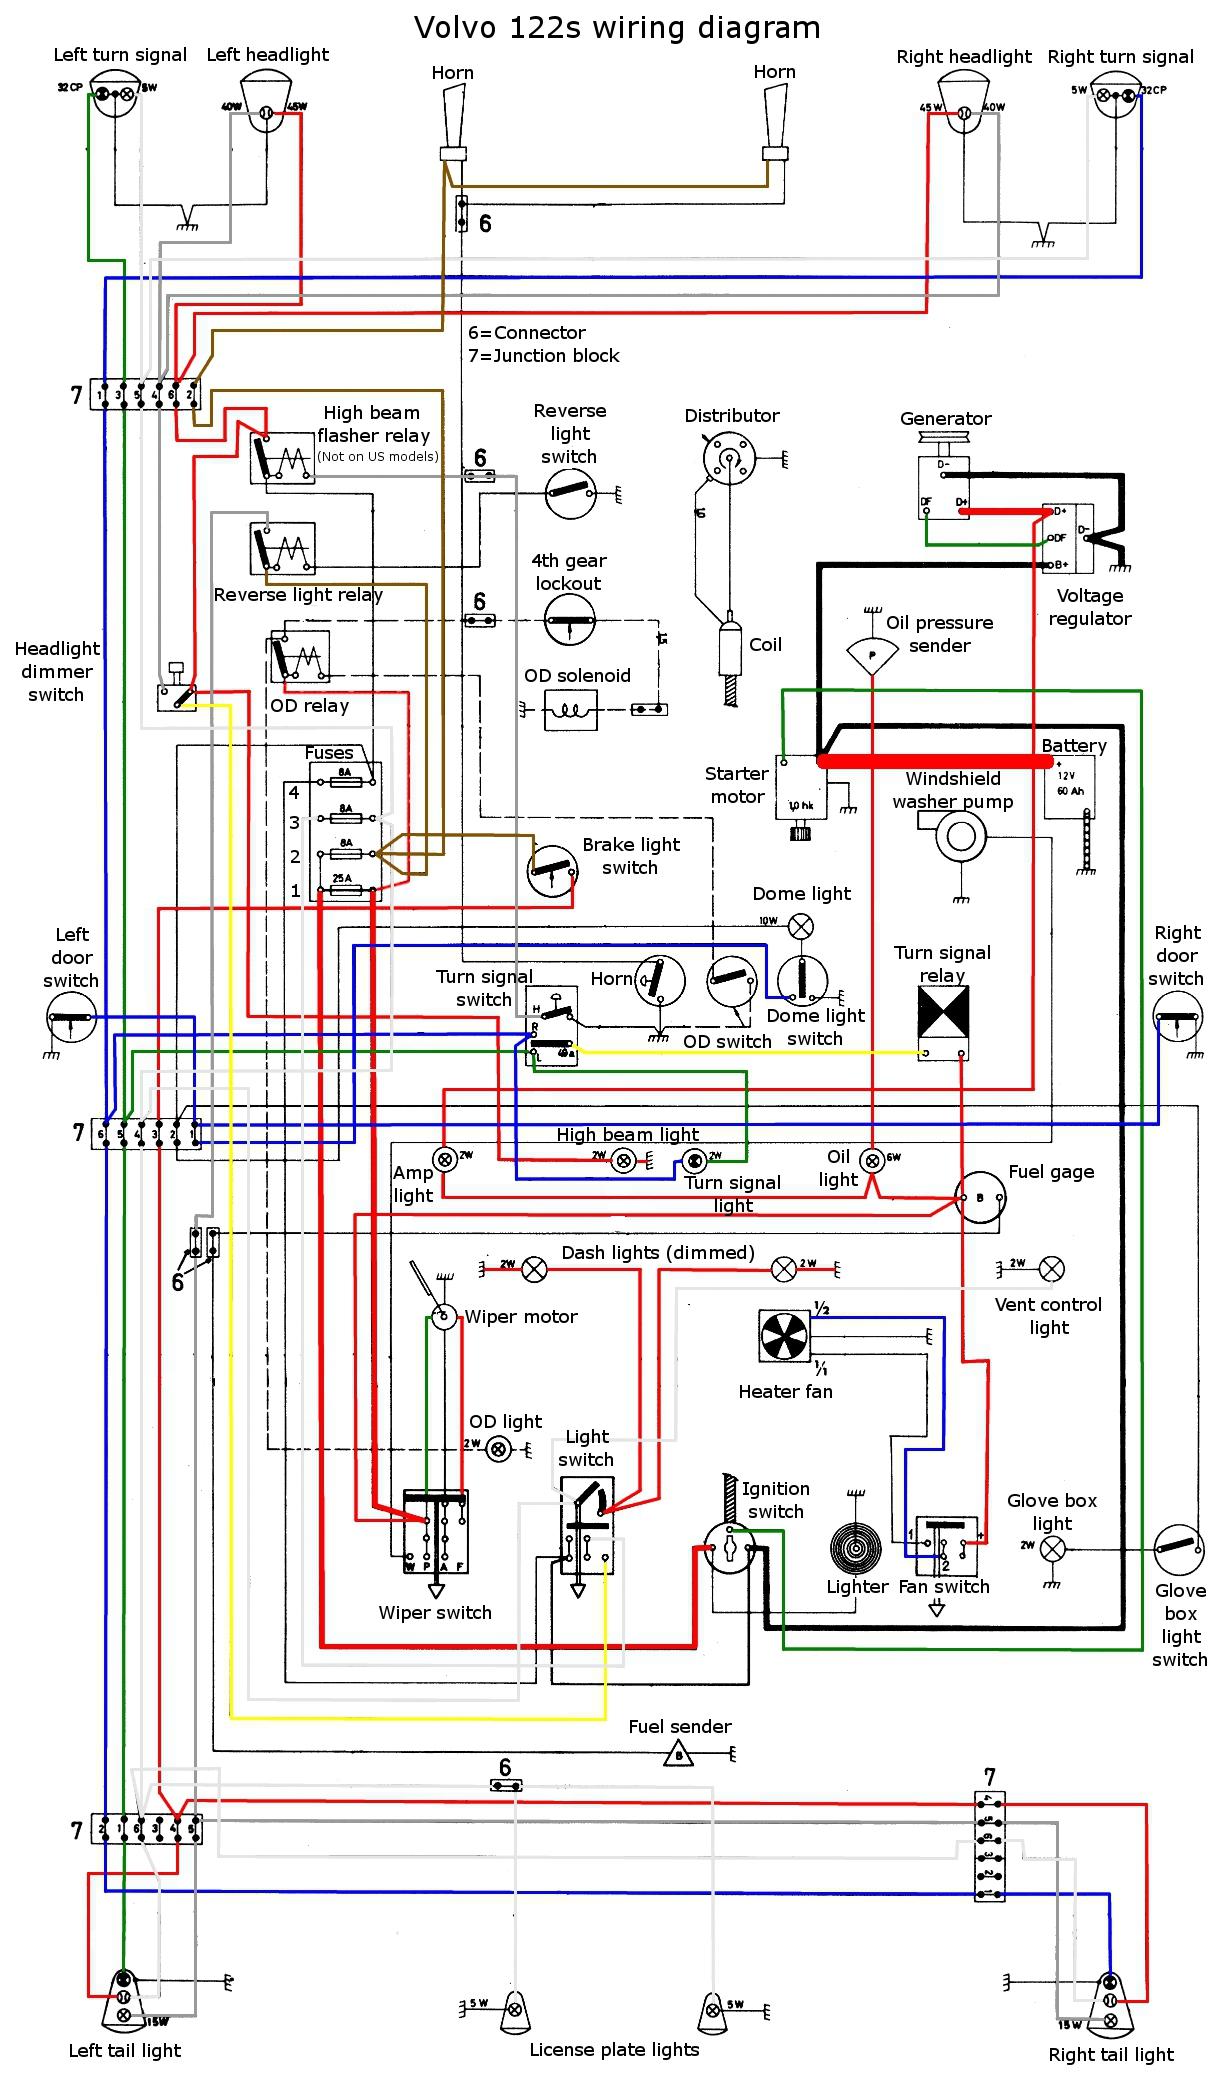 2007 Volvo S60 Wiring Diagram Free Download Wiring Diagram  122%20wiring%20diagram%20color